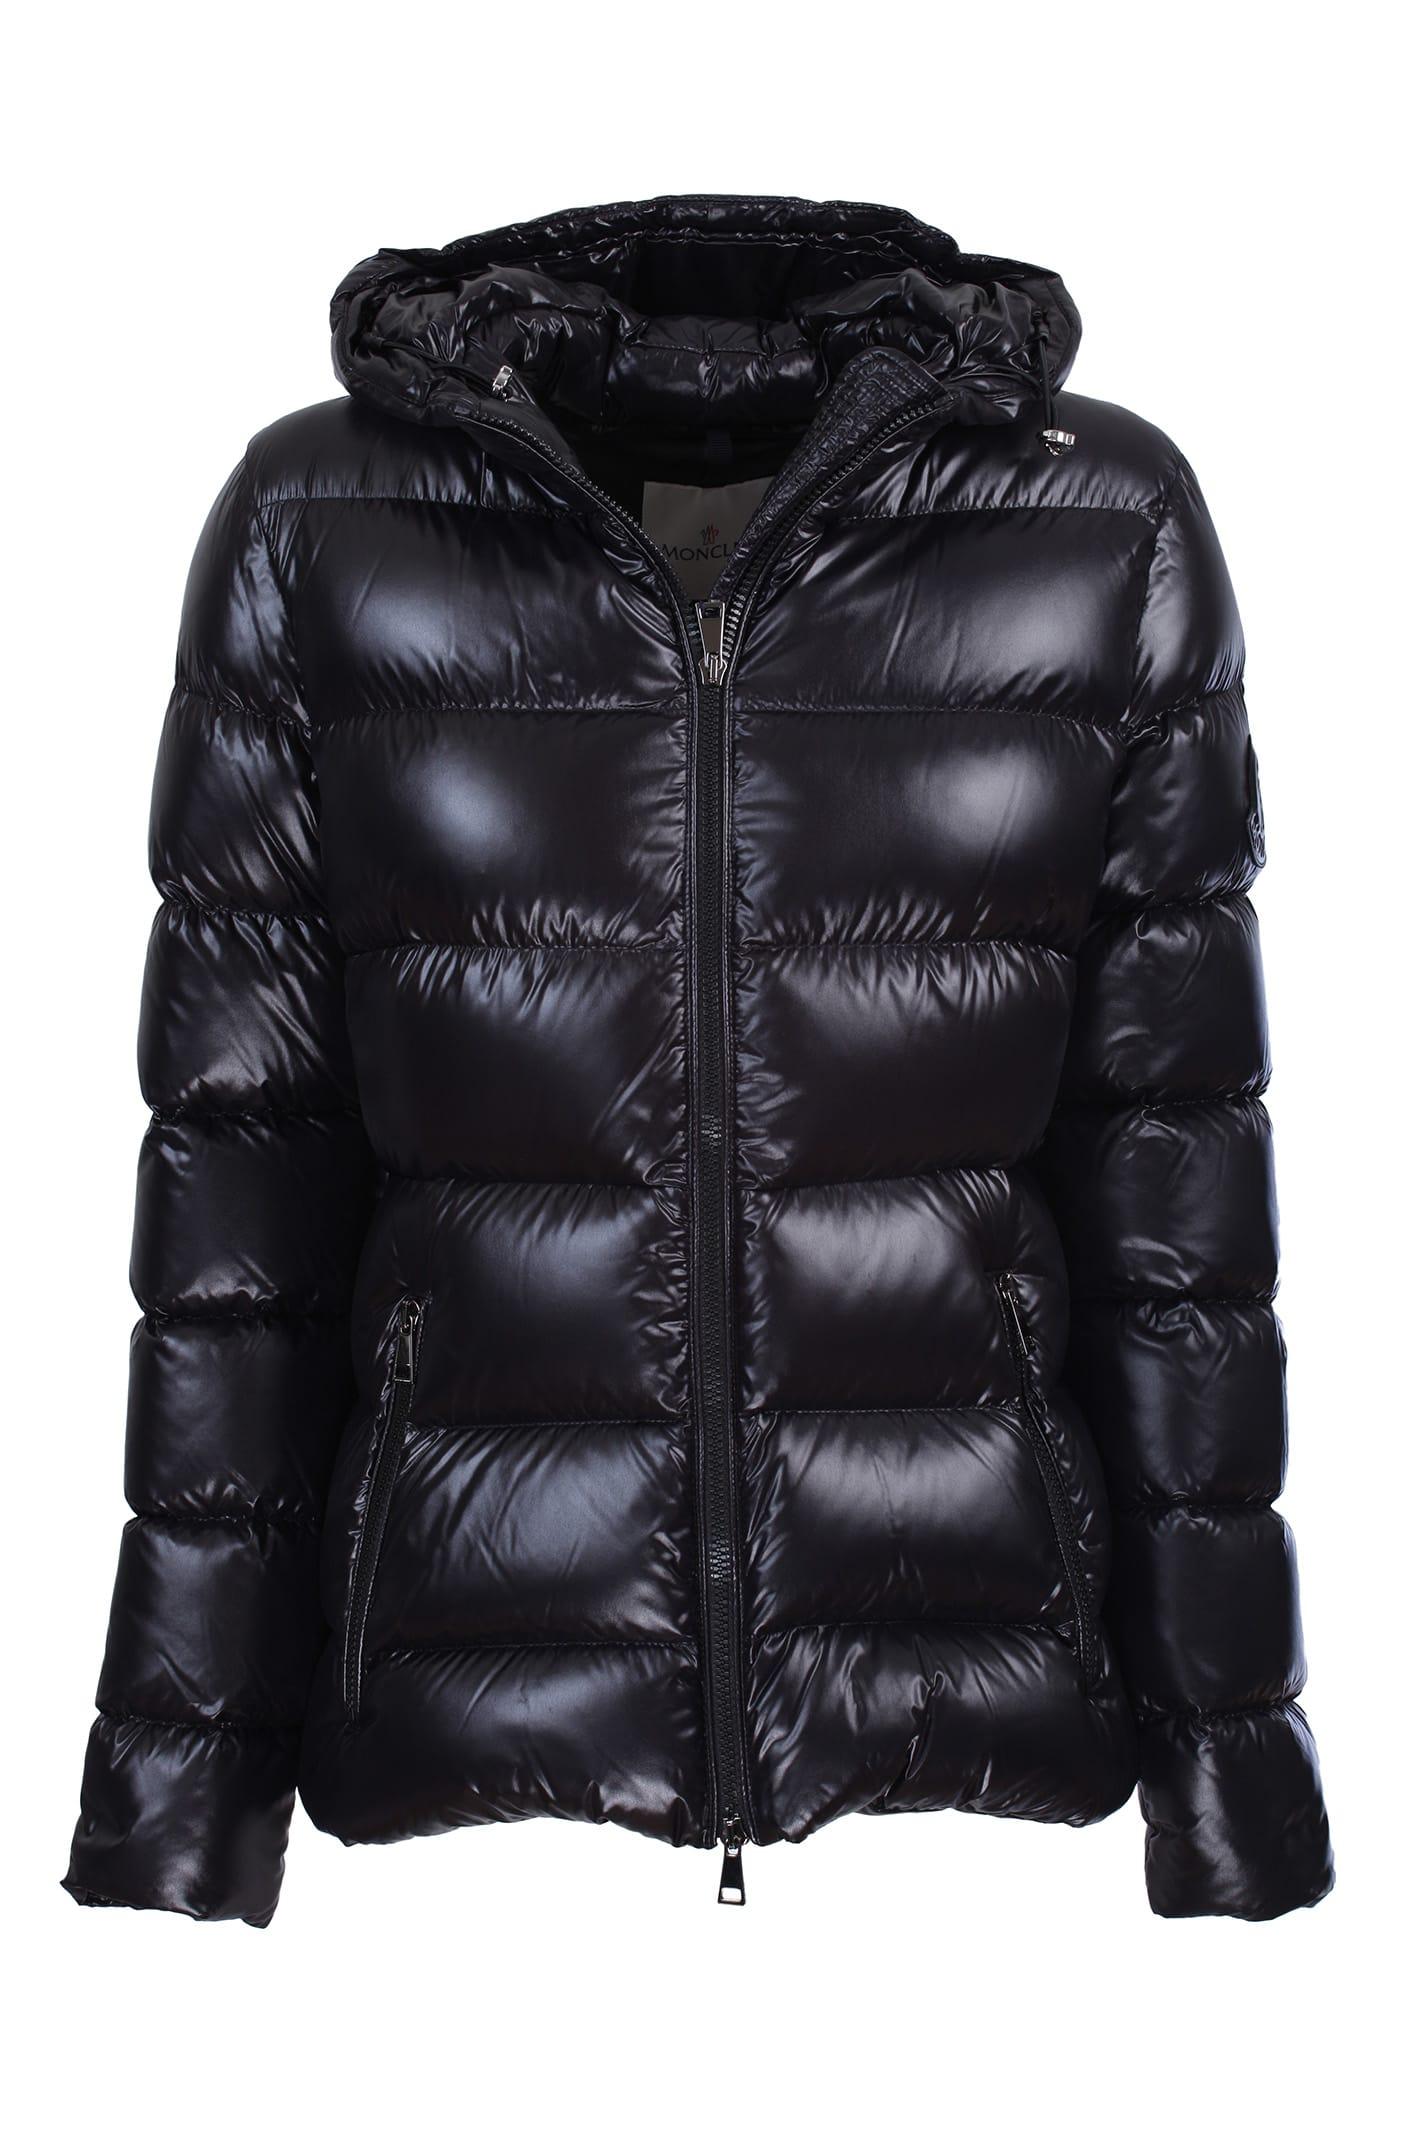 Moncler Rhinestone nylon laqué jacket